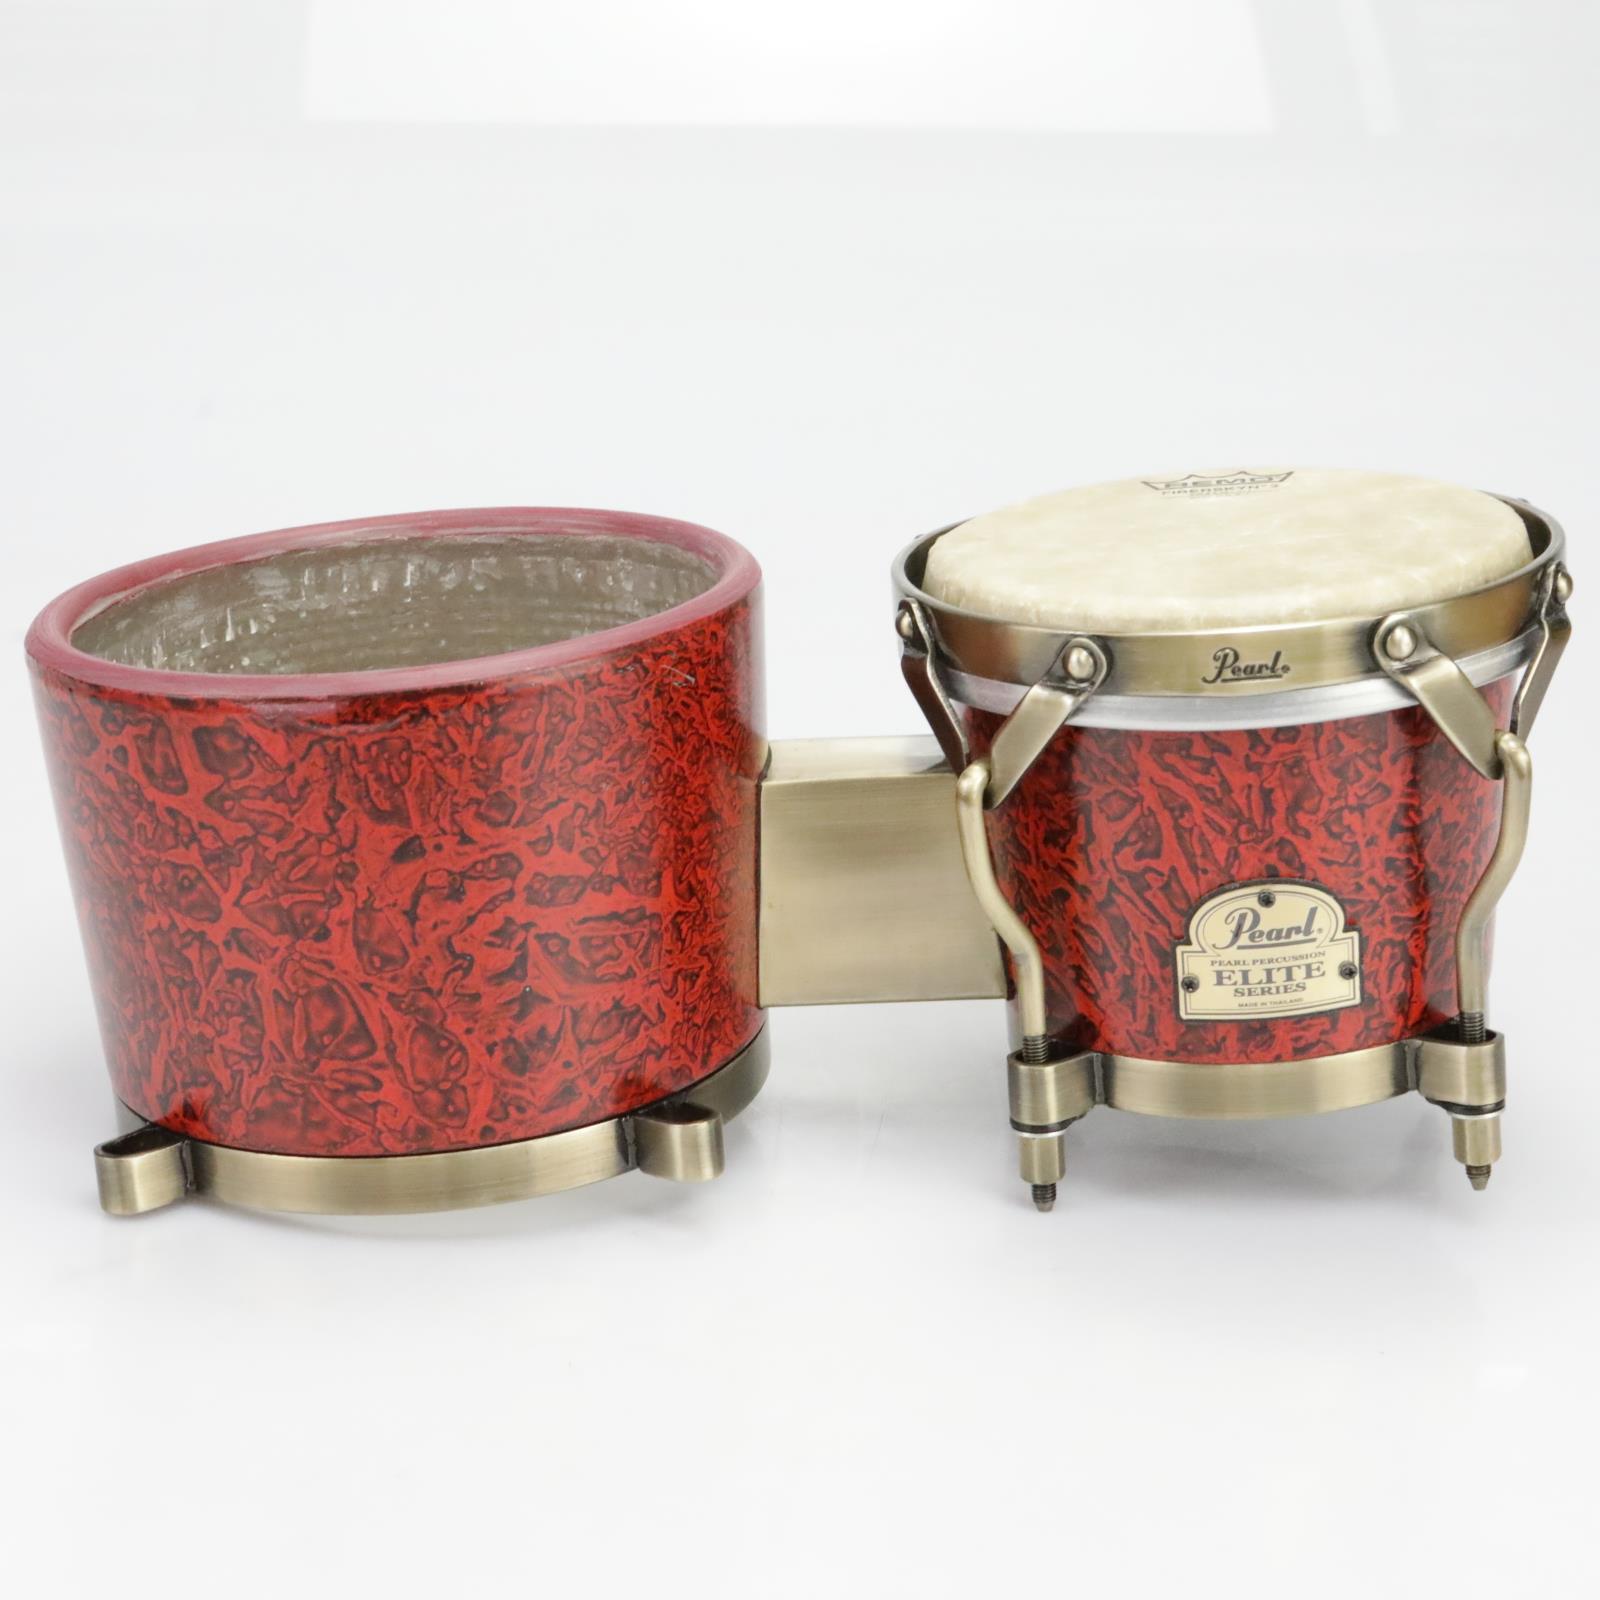 Pearl Elite Series PBF300DX Fiberglass Bongos Percussion #39786